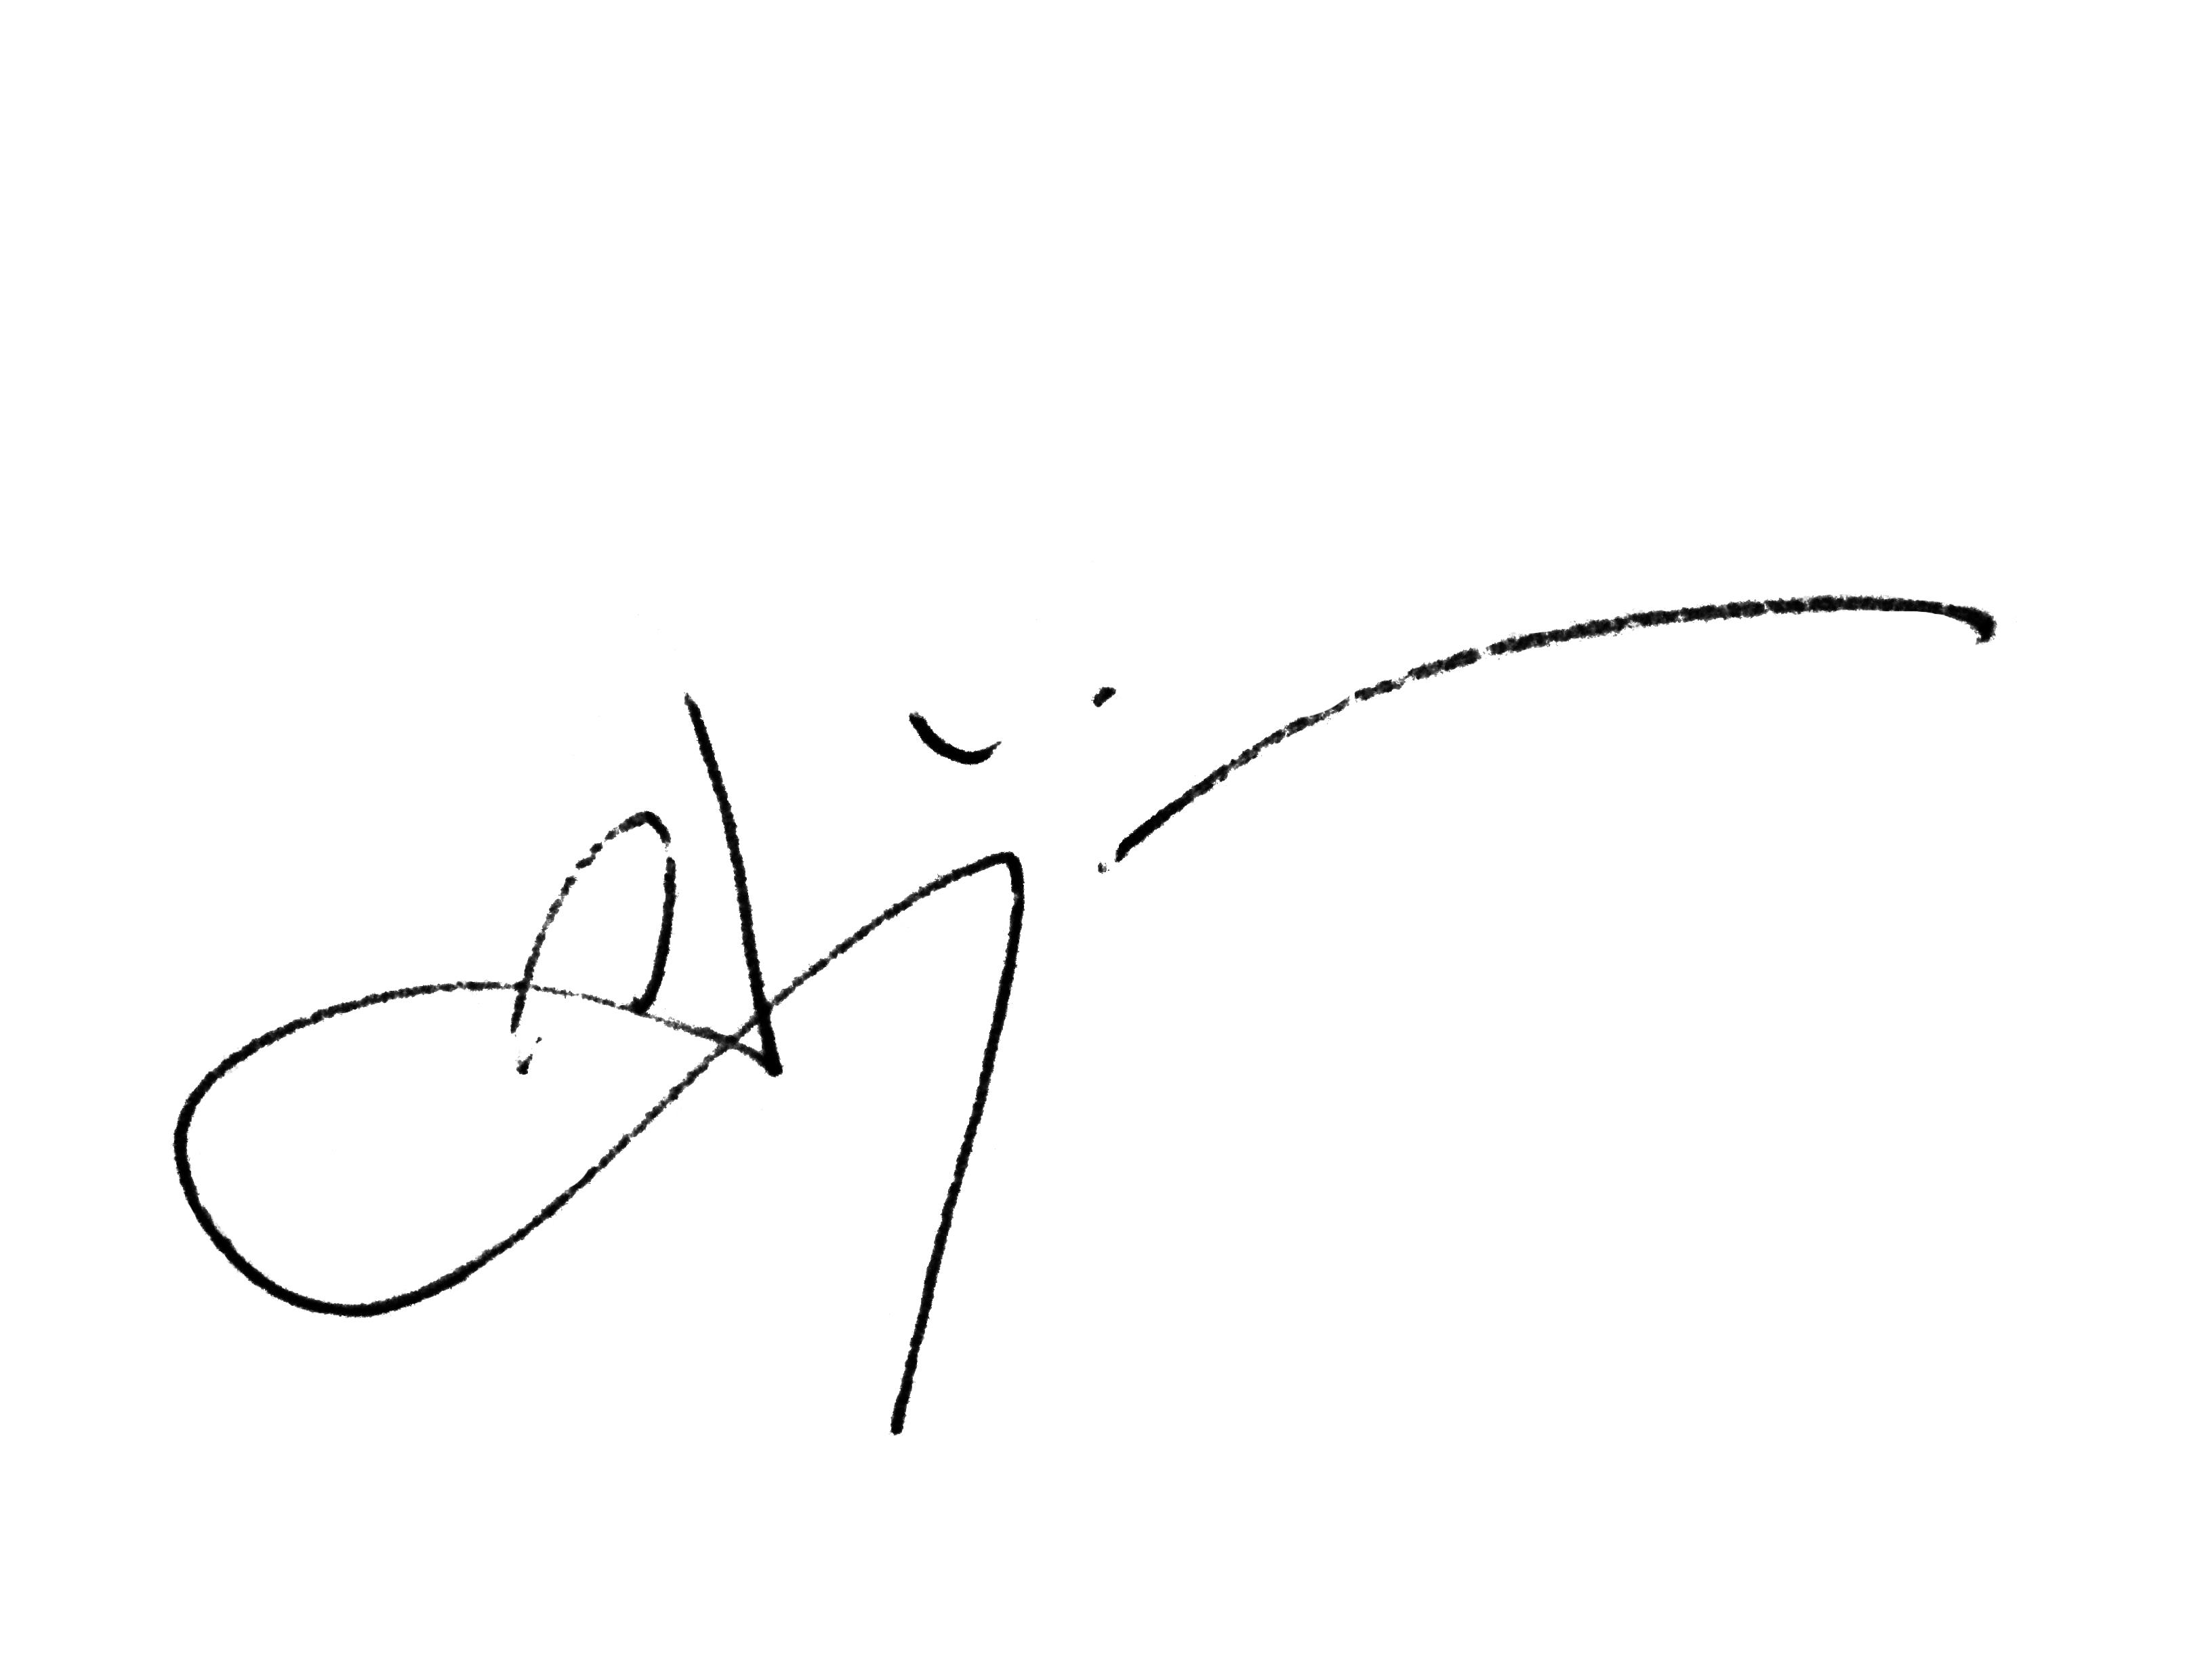 oktay degirmenci's Signature